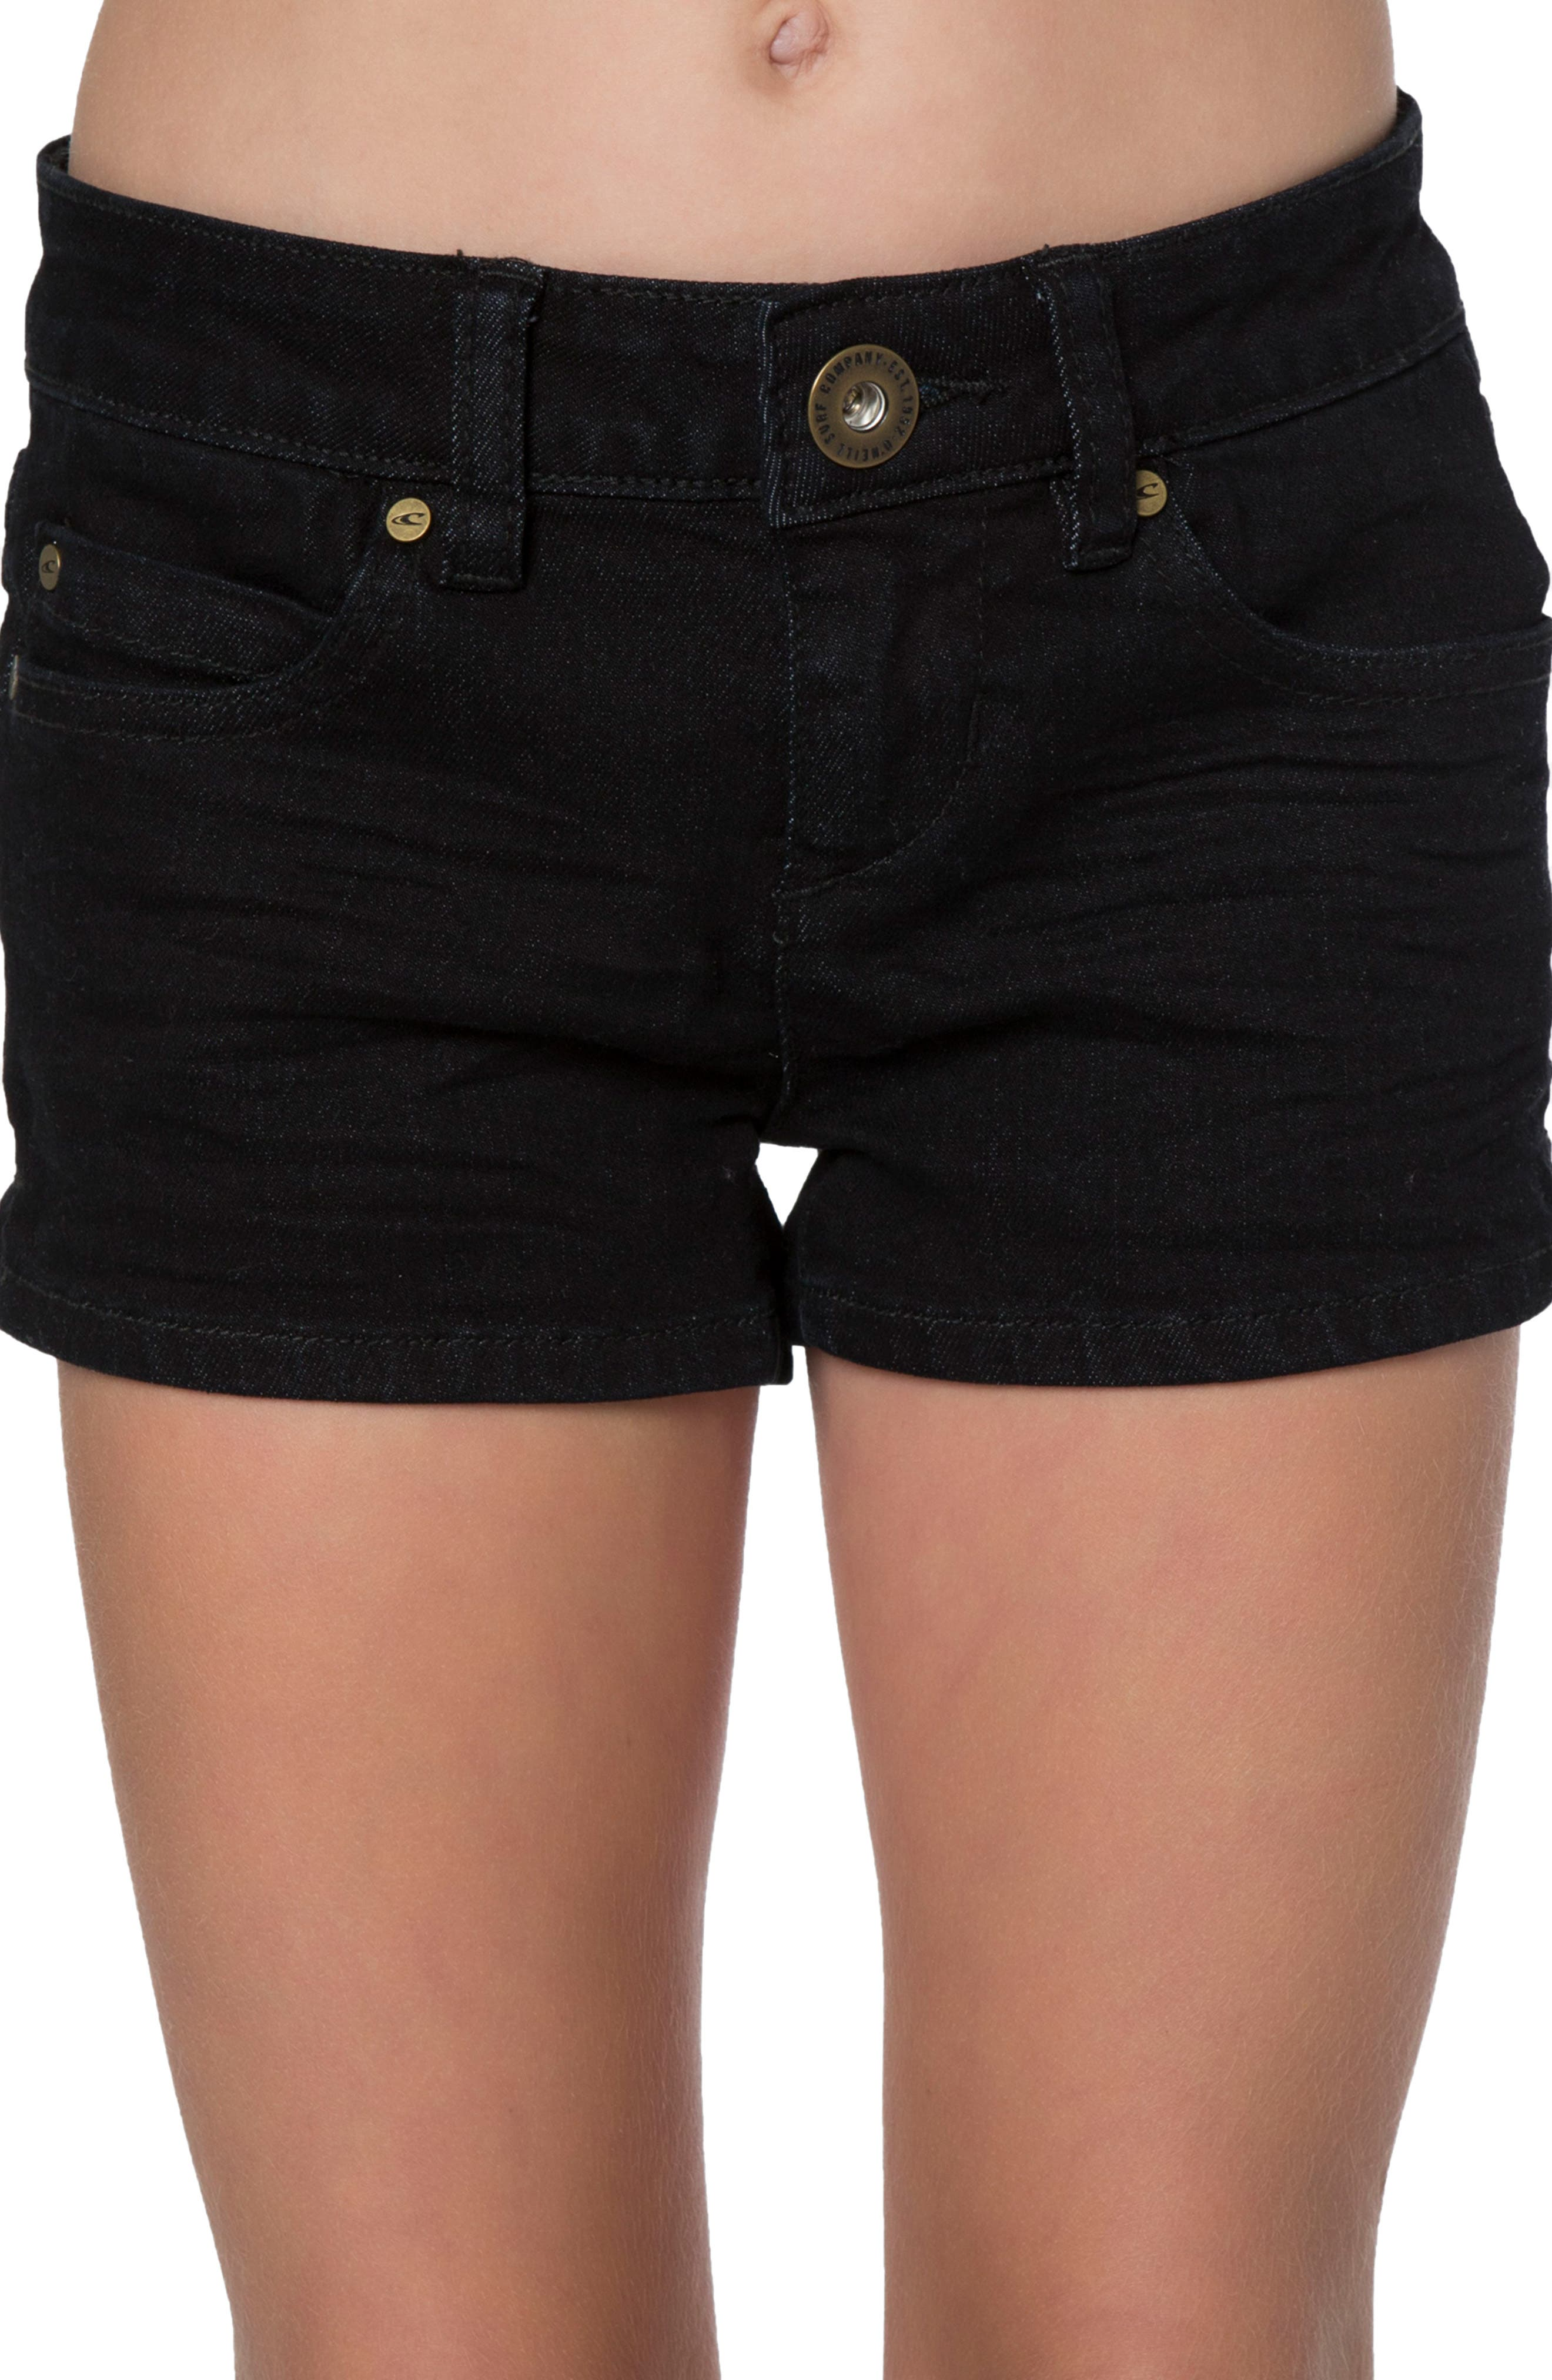 O'Neill Monique Shorts (Big Girls)